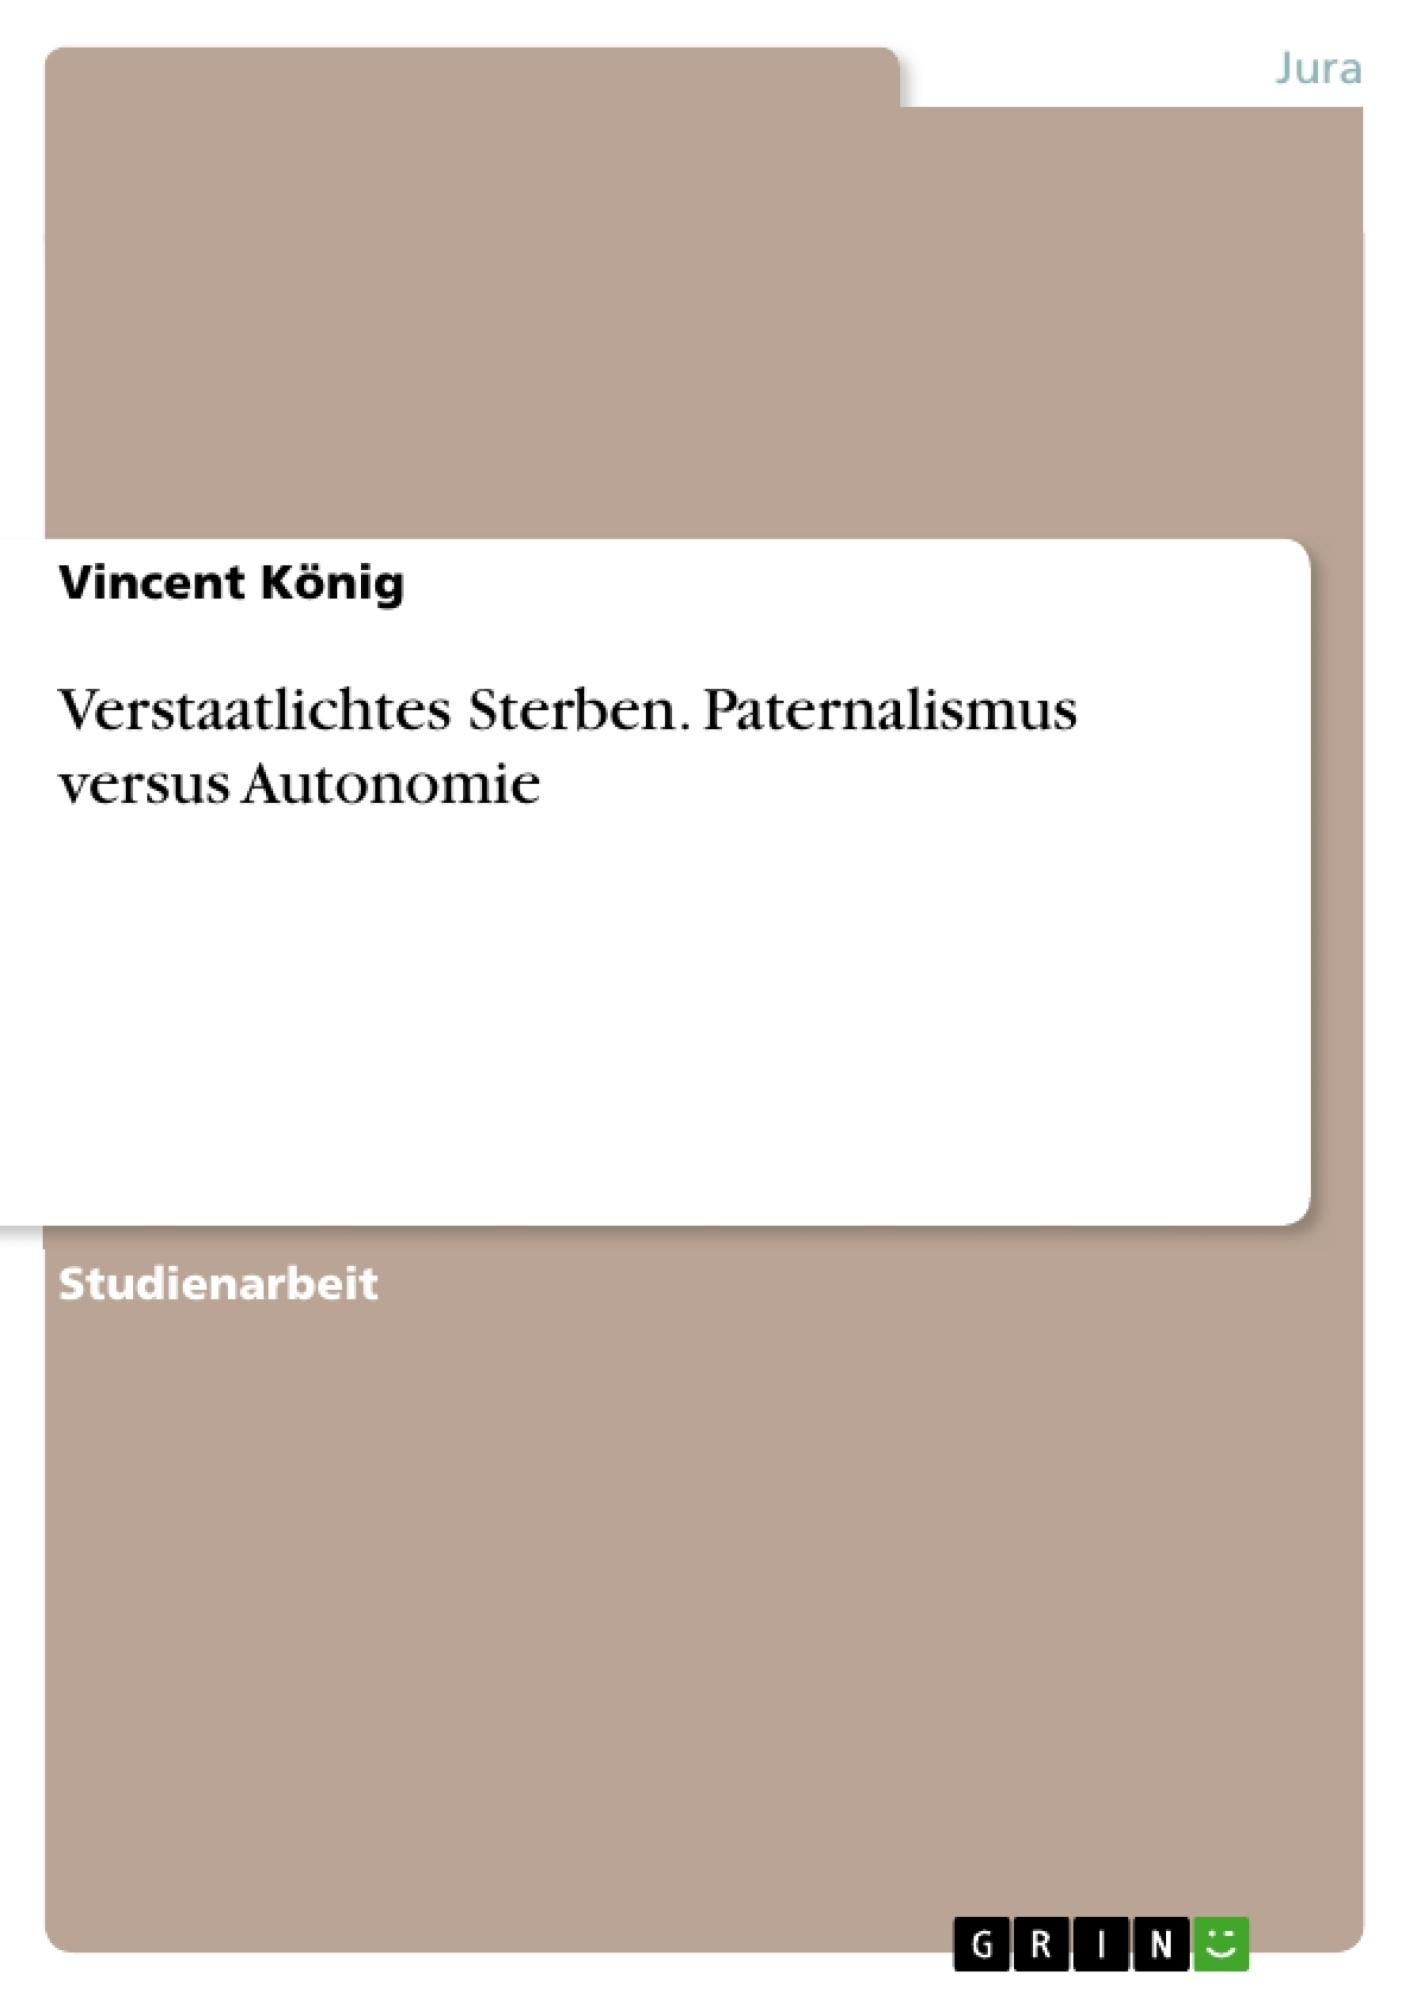 Titel: Verstaatlichtes Sterben. Paternalismus versus Autonomie